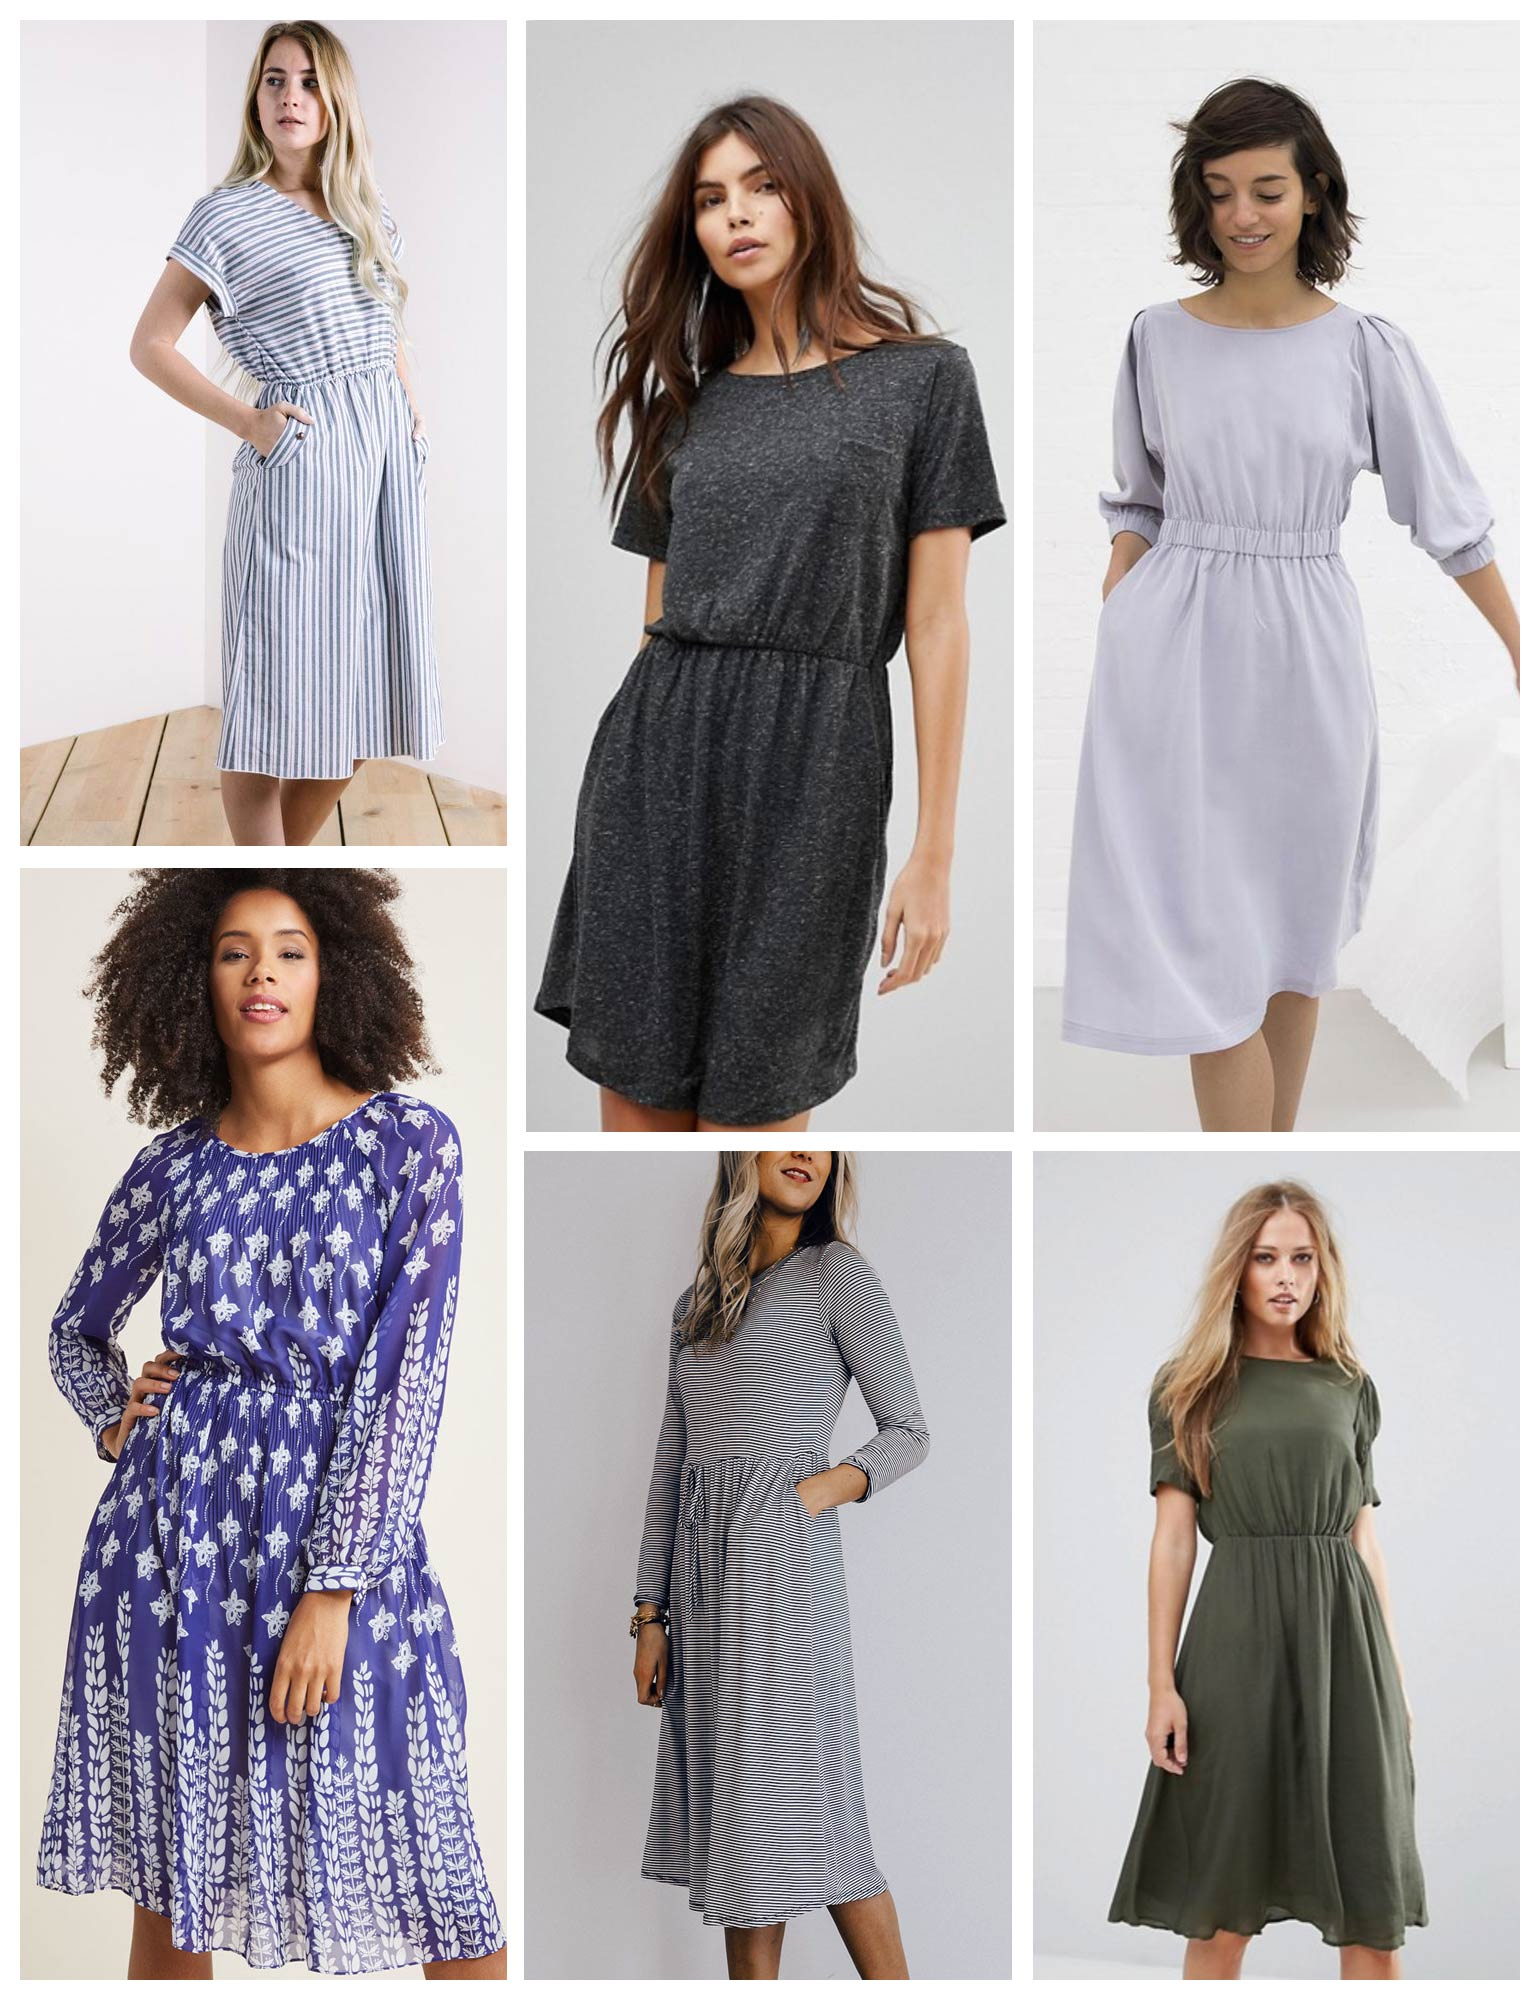 Lou Box Dress 2 Inspiration | Sew DIY